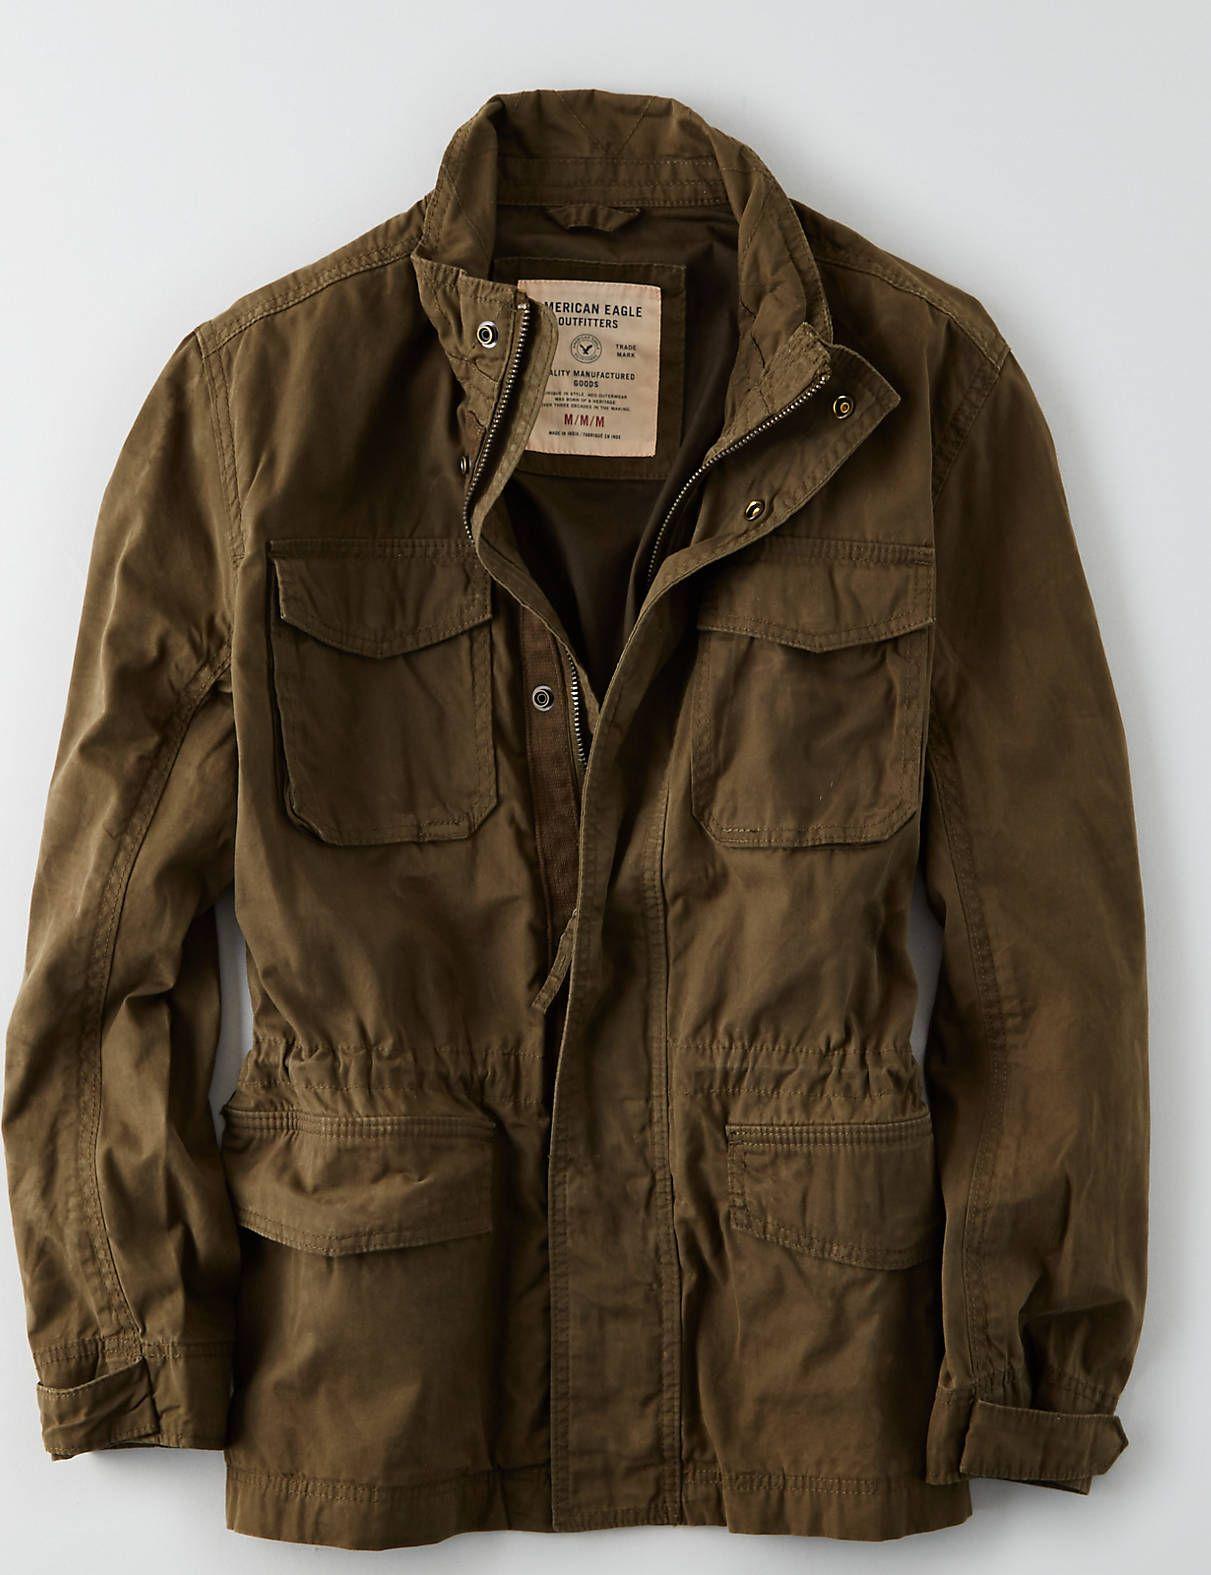 Aeo Military Jacket Olive Jackets Men Fashion Mens Fashion Rugged Mens Winter Fashion Outfits